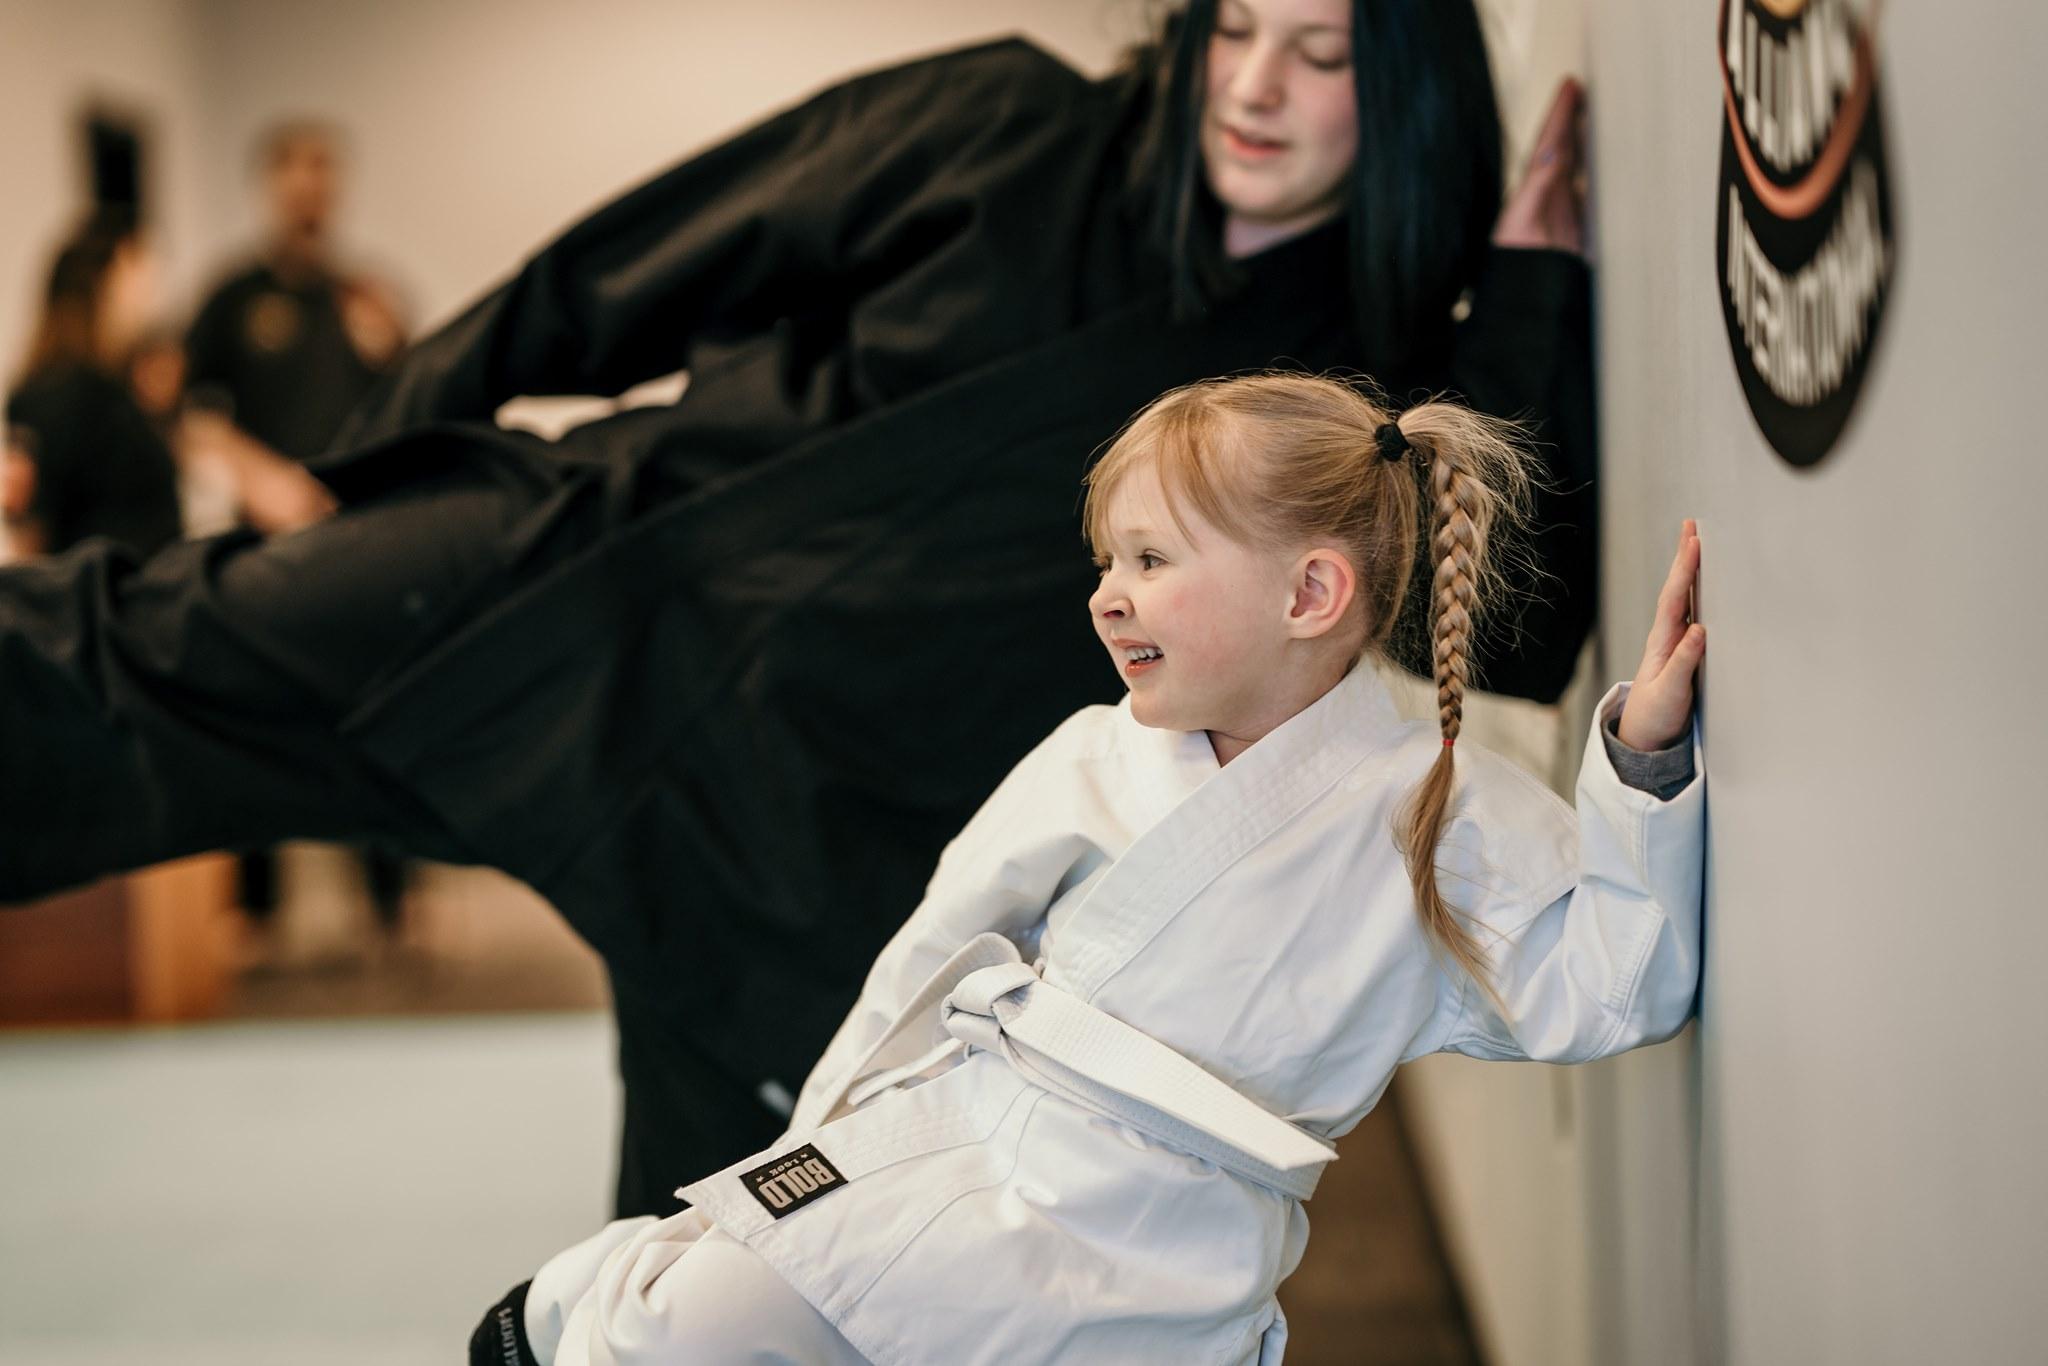 Colorado's Top Rated Local® Business: Ohana Martial Arts Academy